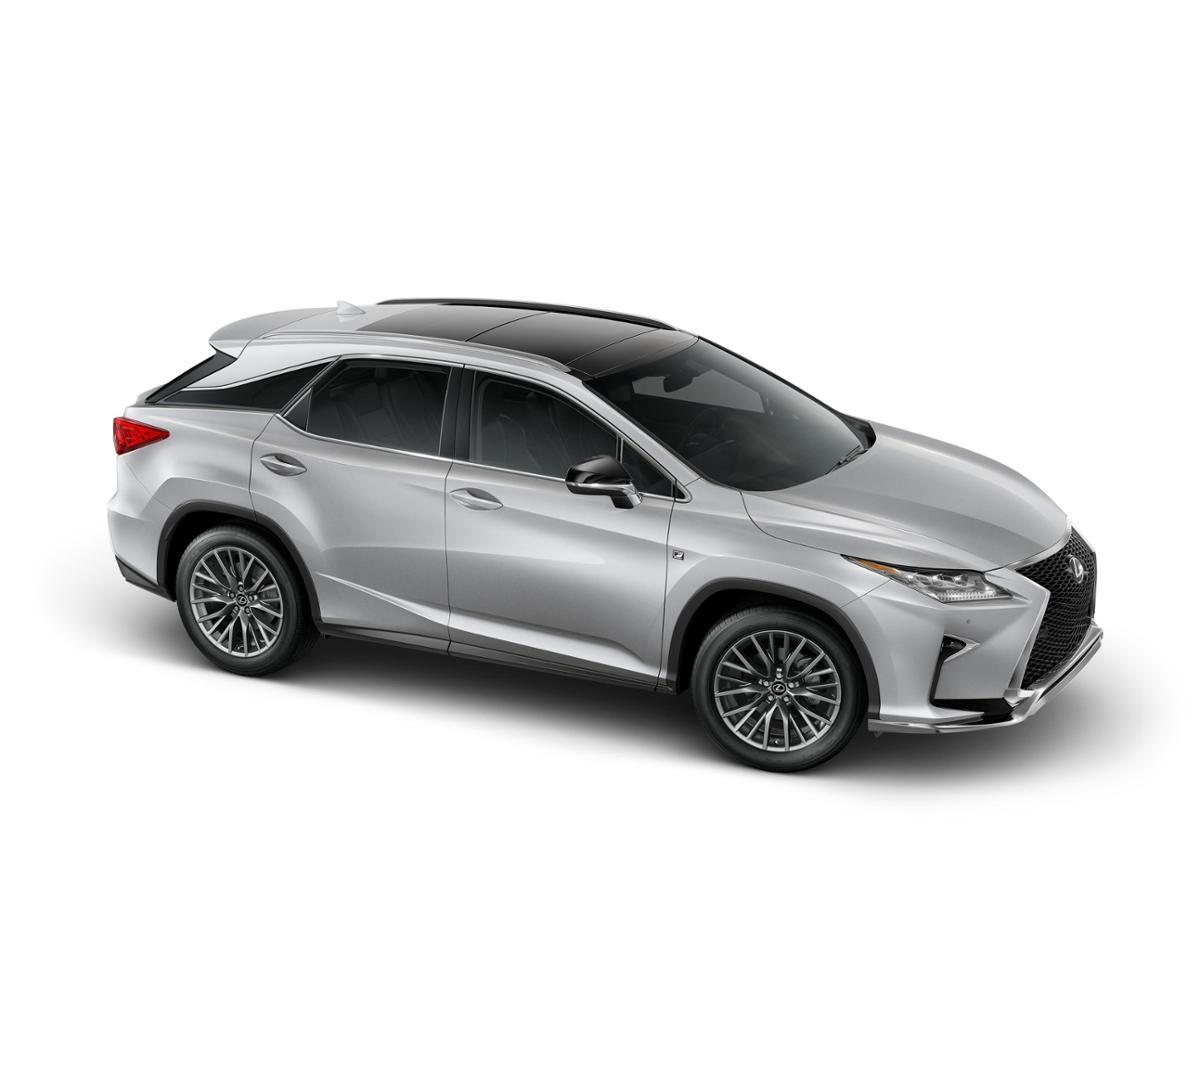 Lexus Rx350 Lease: 2019 Lexus RX 350 For Sale In Duluth